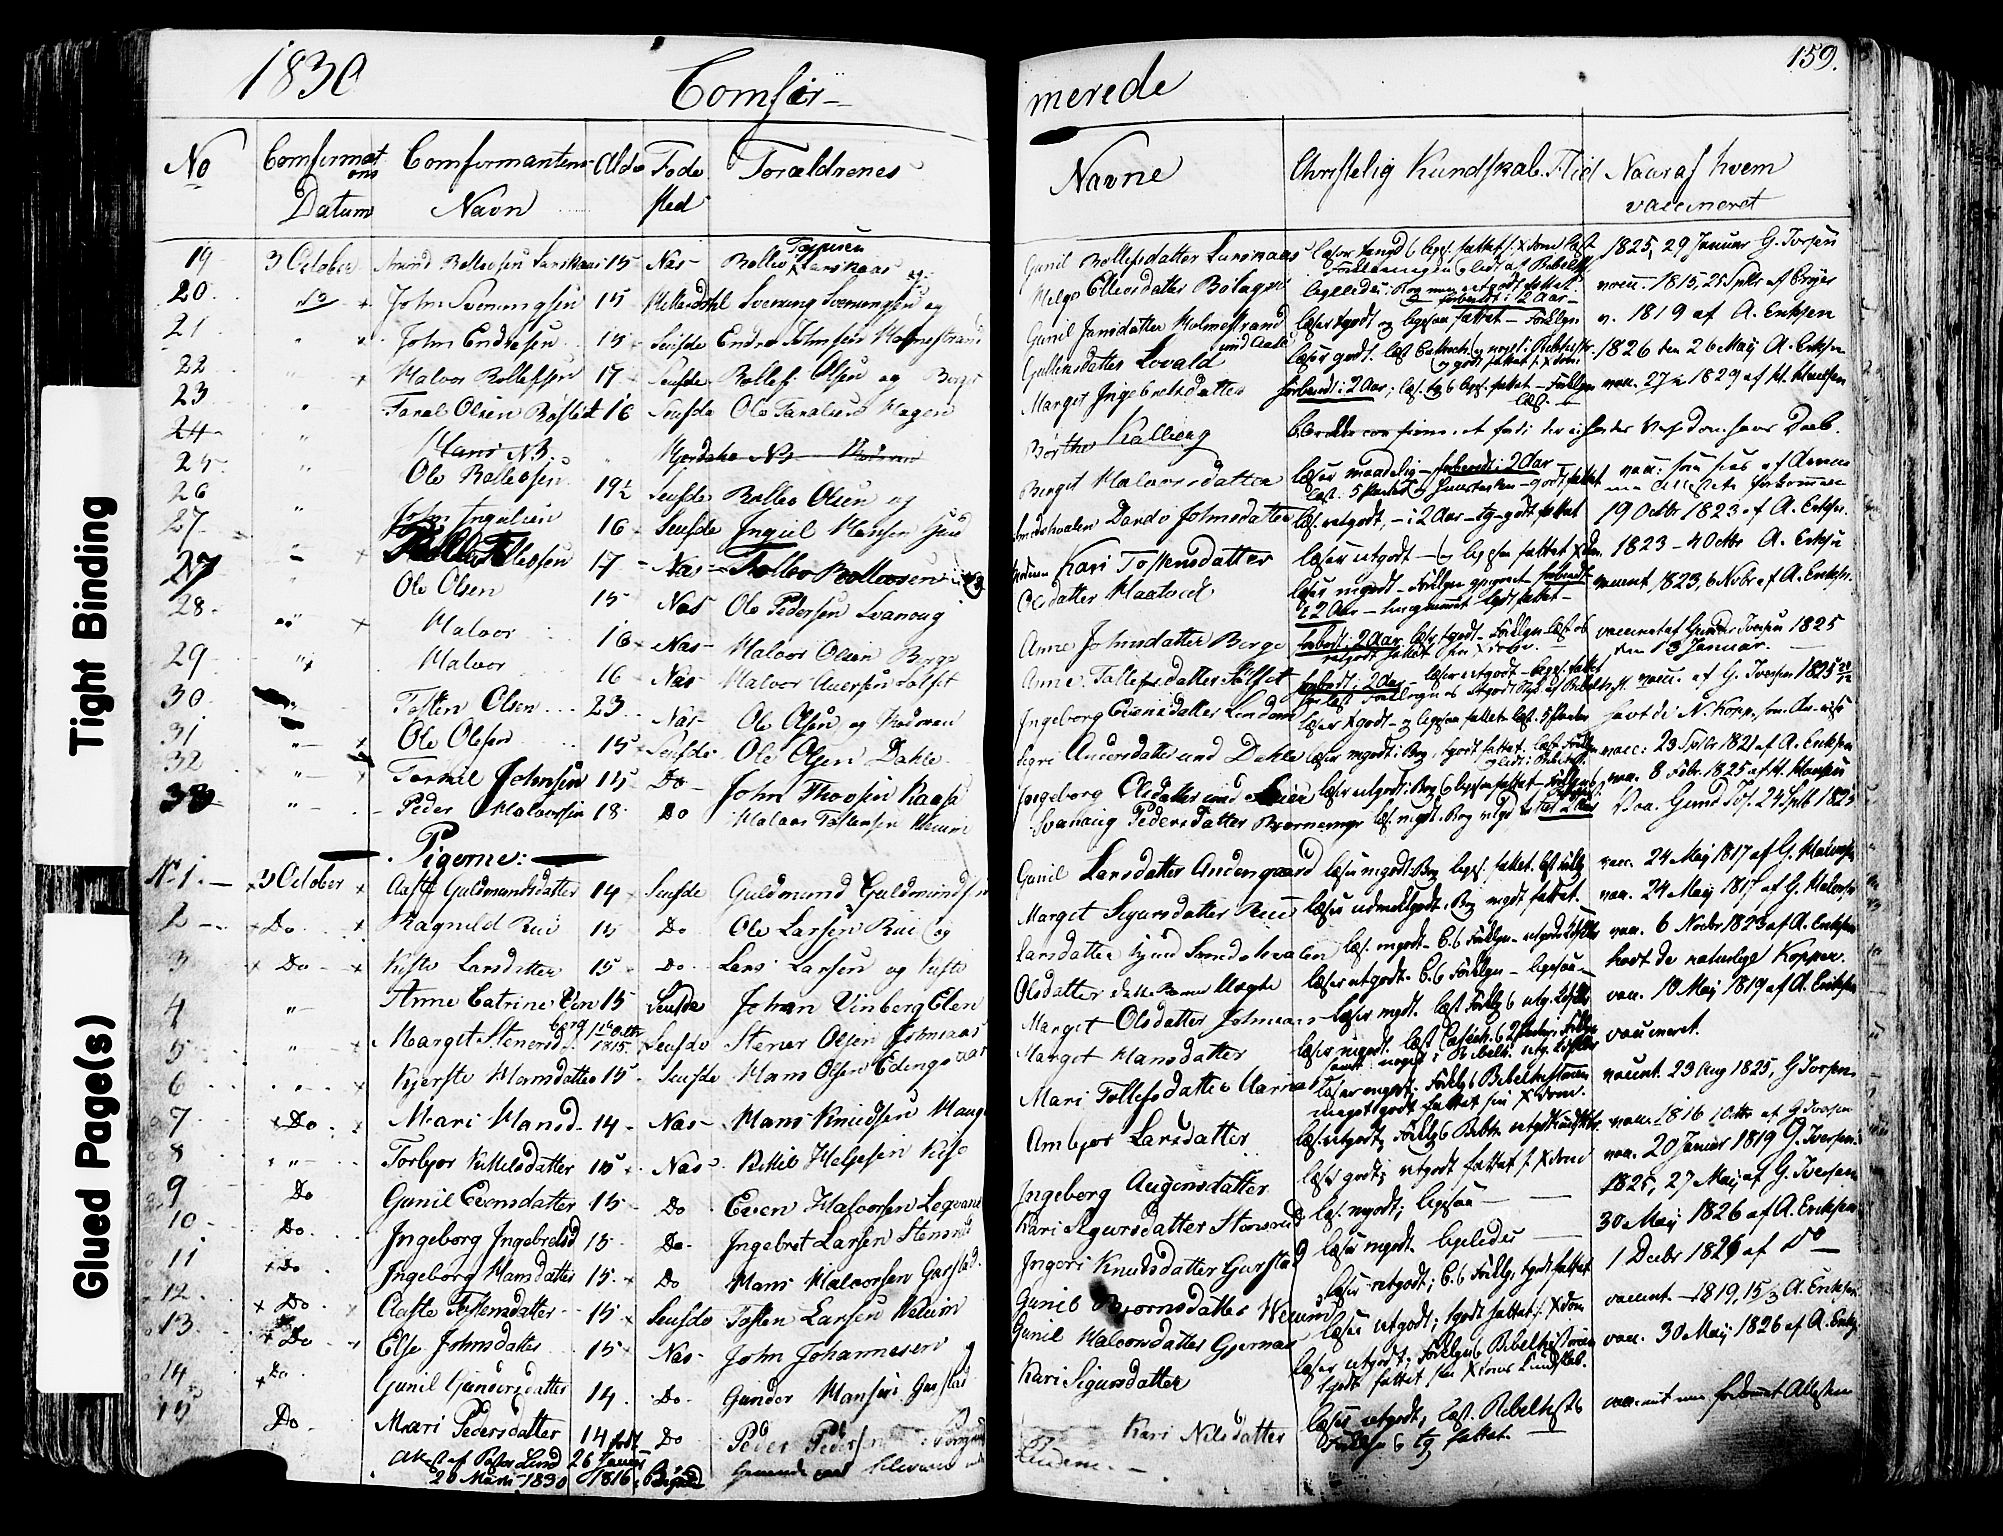 SAKO, Sauherad kirkebøker, F/Fa/L0006: Ministerialbok nr. I 6, 1827-1850, s. 159